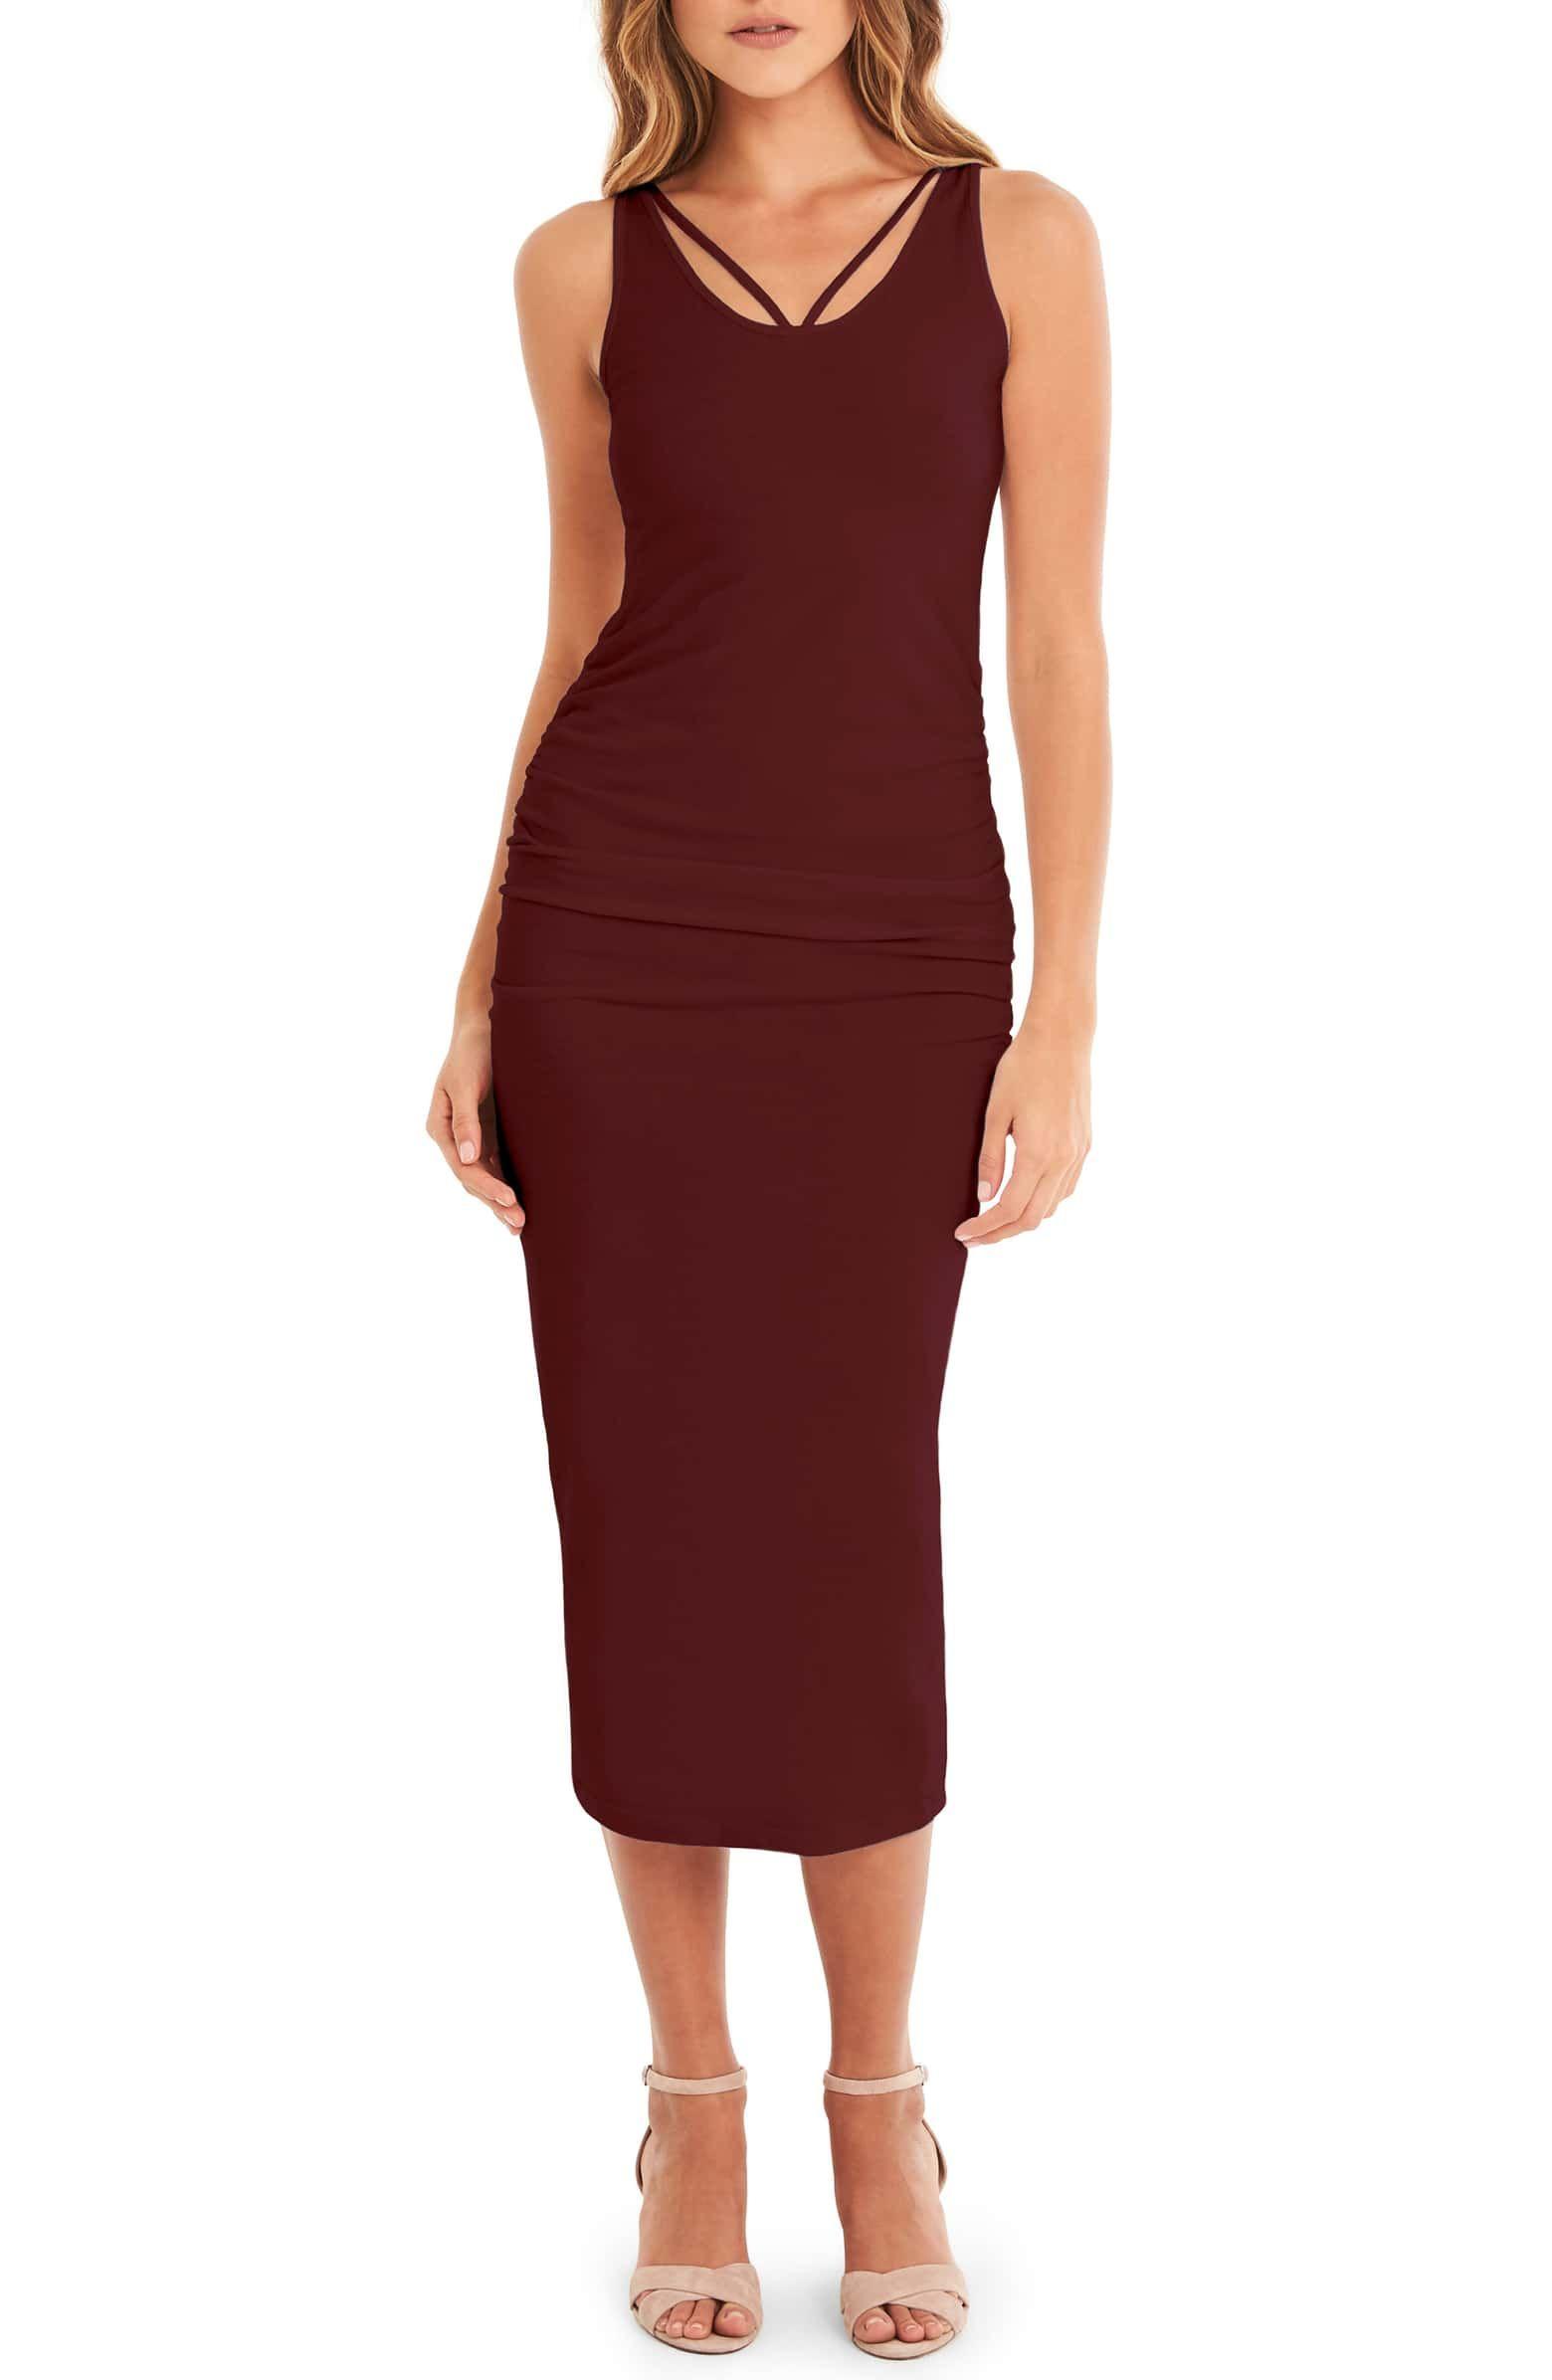 Michael Stars Reversible Stretch Cotton Midi Dress Nordstrom Cotton Midi Dress Midi Dress Nordstrom Dresses [ 2392 x 1560 Pixel ]